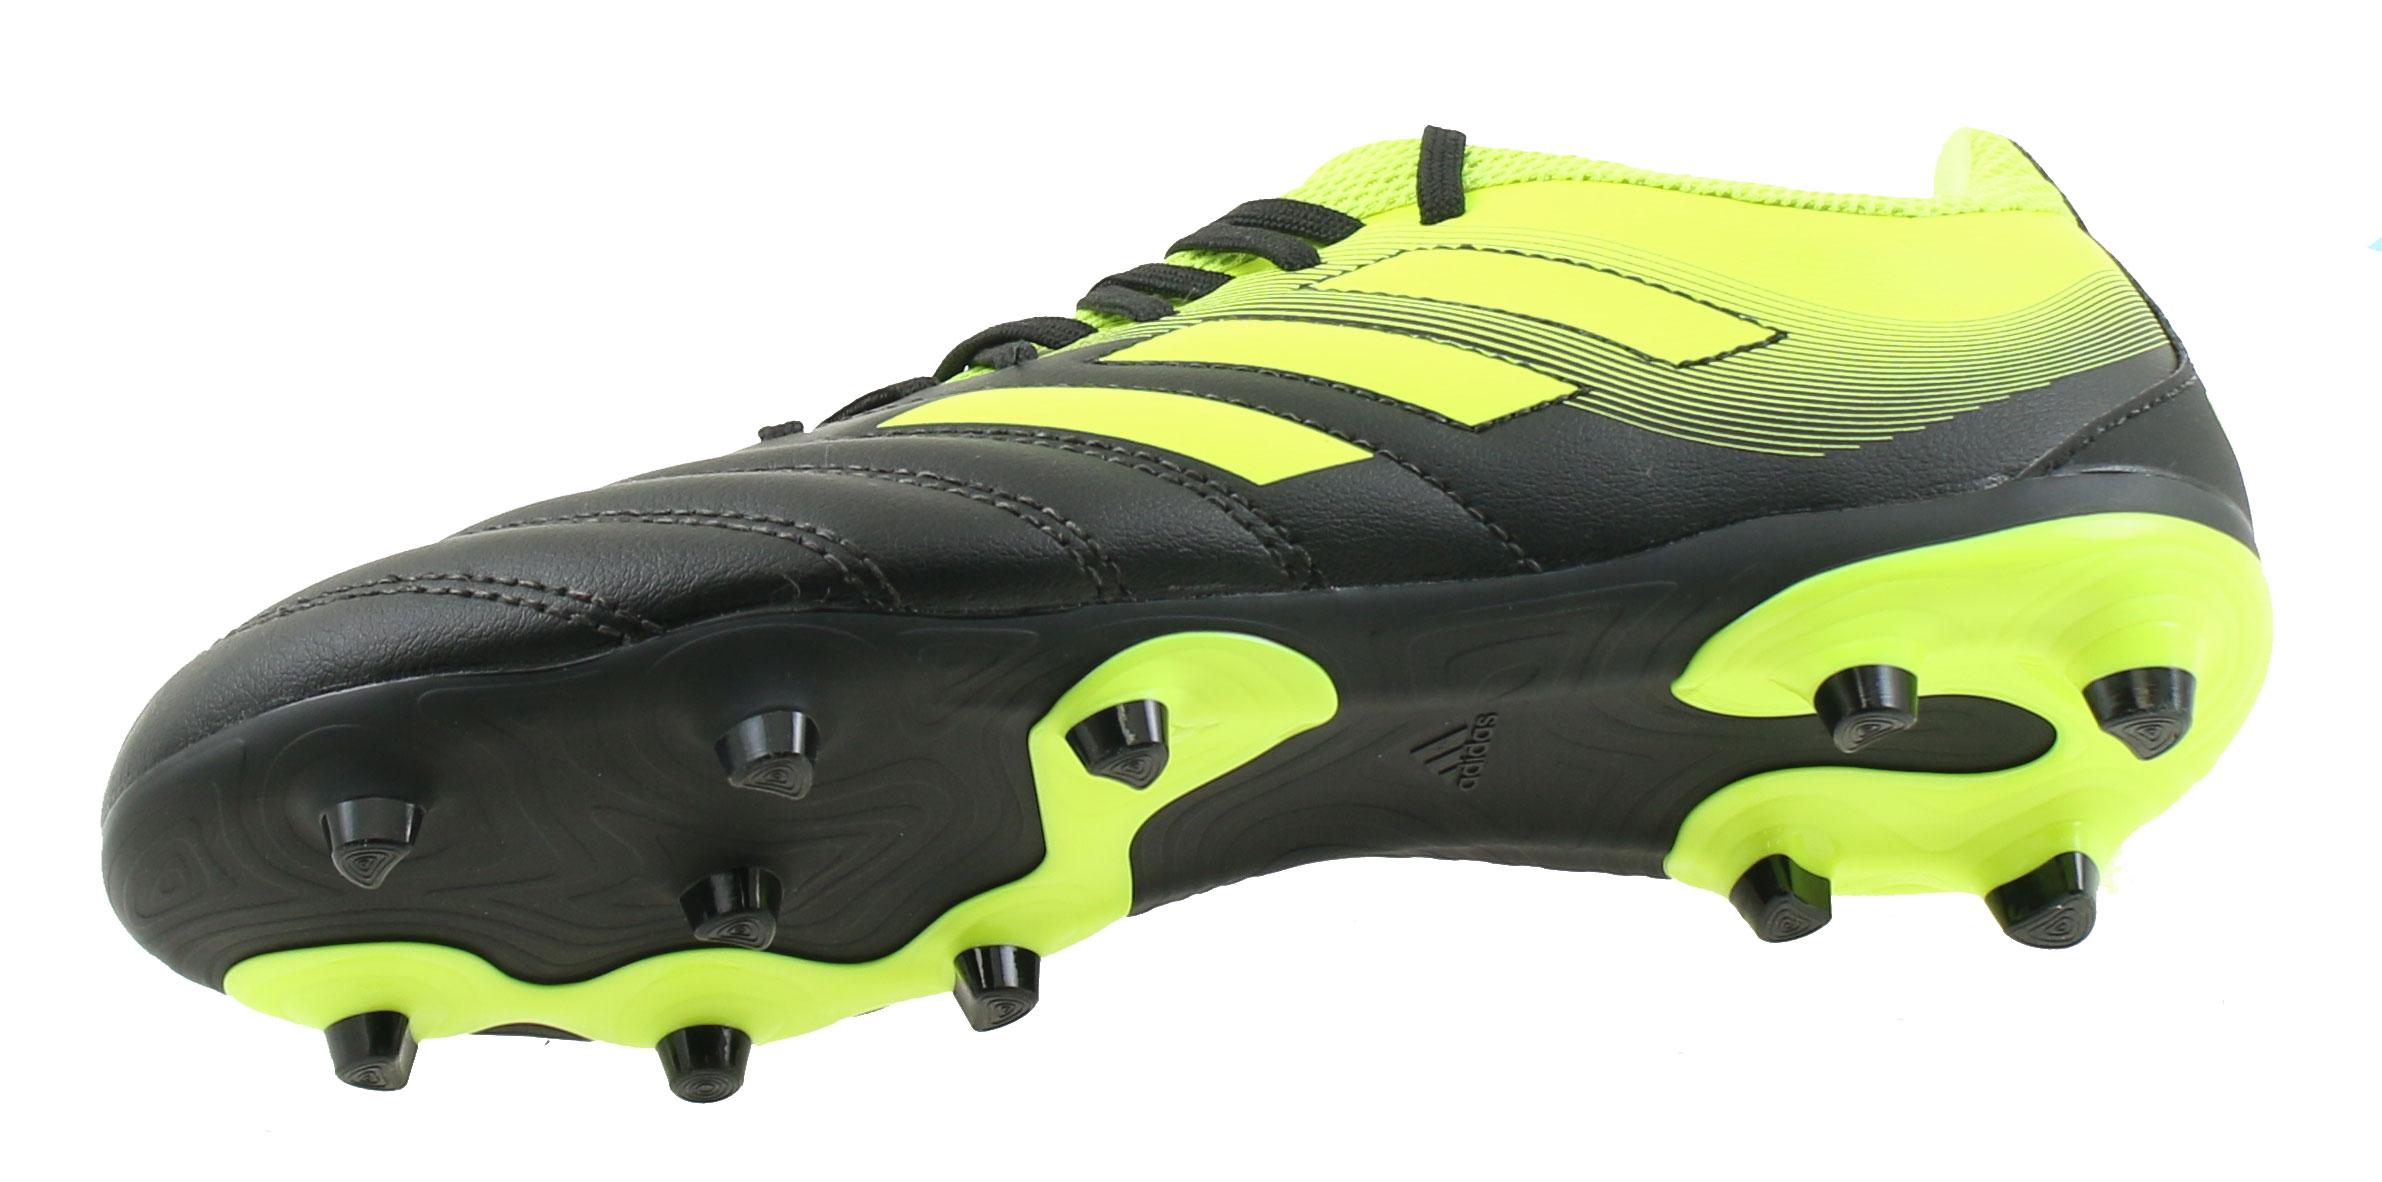 quality design cf697 a796d Adidas Copa 19.3 FG Junior. D98080 Core Black Solar Yellow. Product  afbeelding Product afbeelding Product afbeelding Product afbeelding